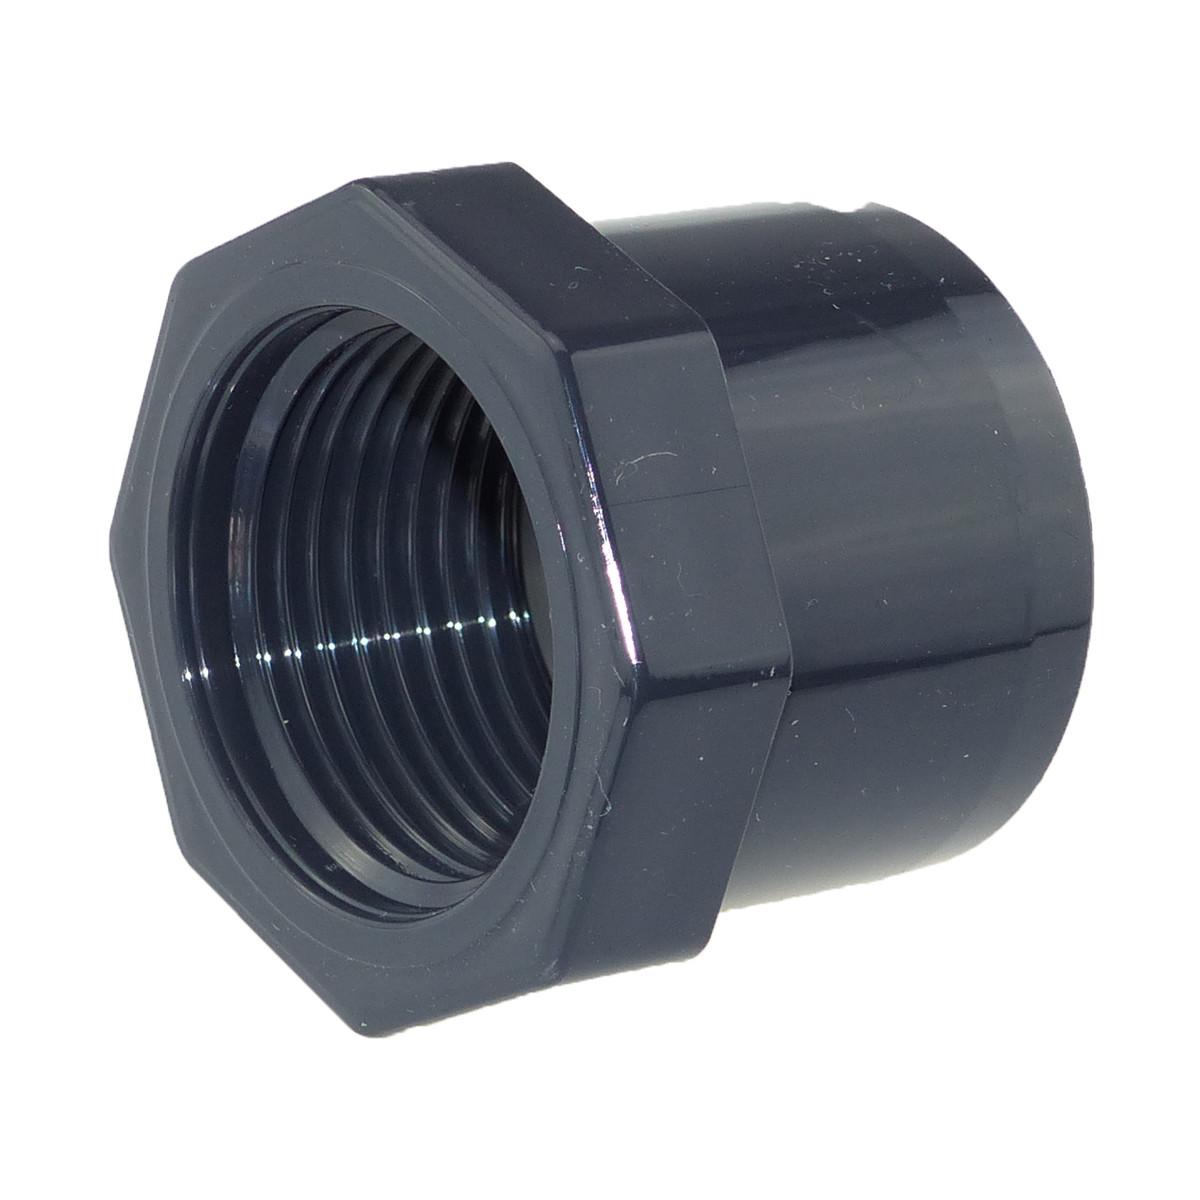 Cepex/Plimat/CH PVC Reduzierstutzen 40 mm x 3/4 Zoll